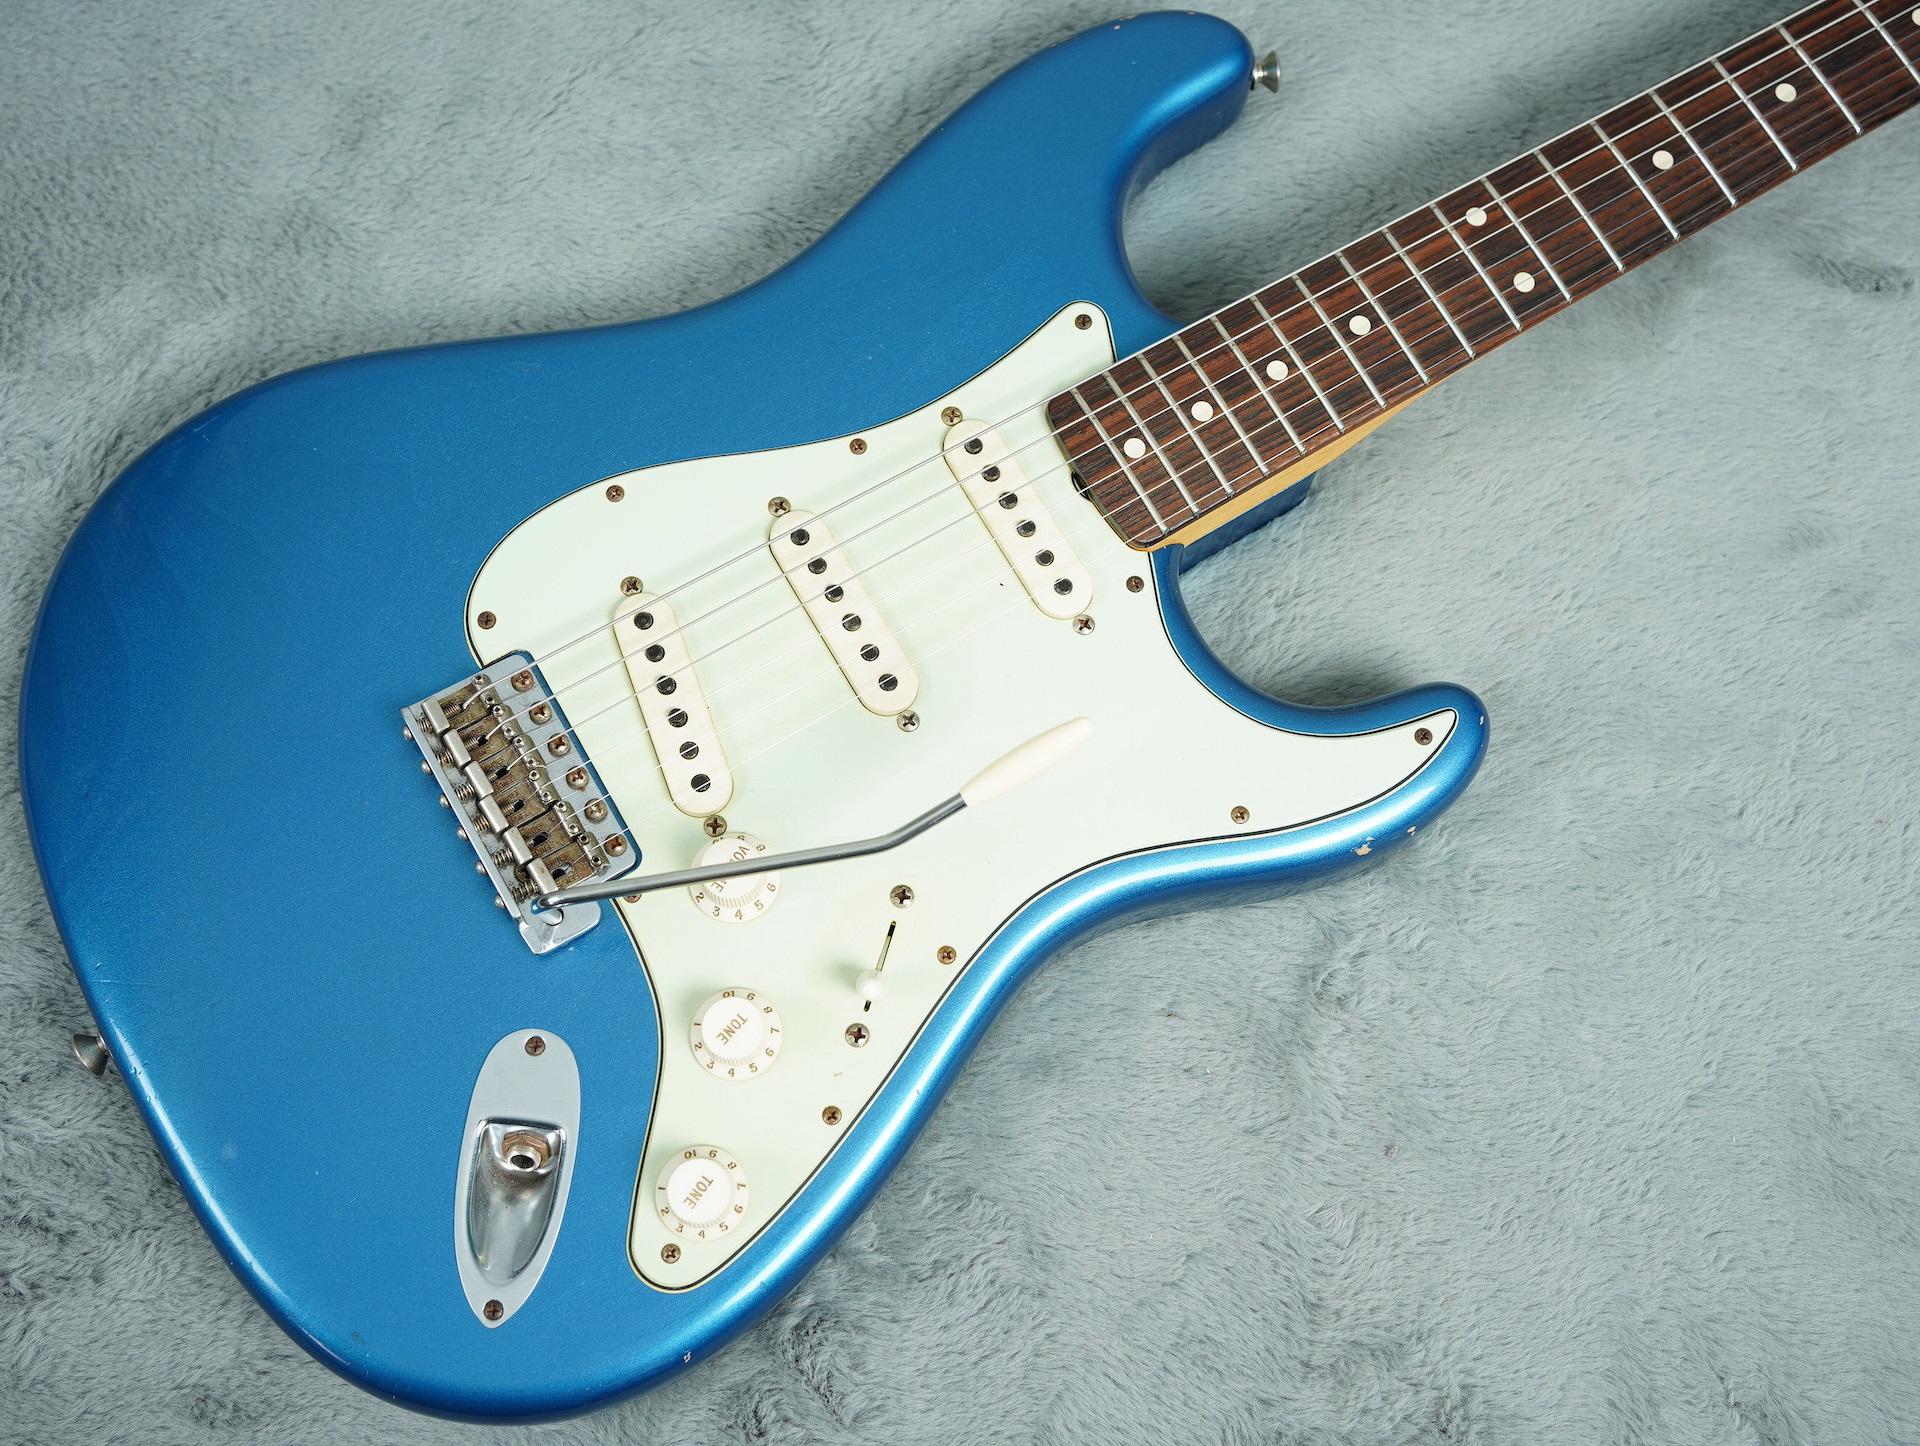 2012 Fender Custom Shop 60 Relic Stratocaster Abigail Ybarra Pickups + OHSC